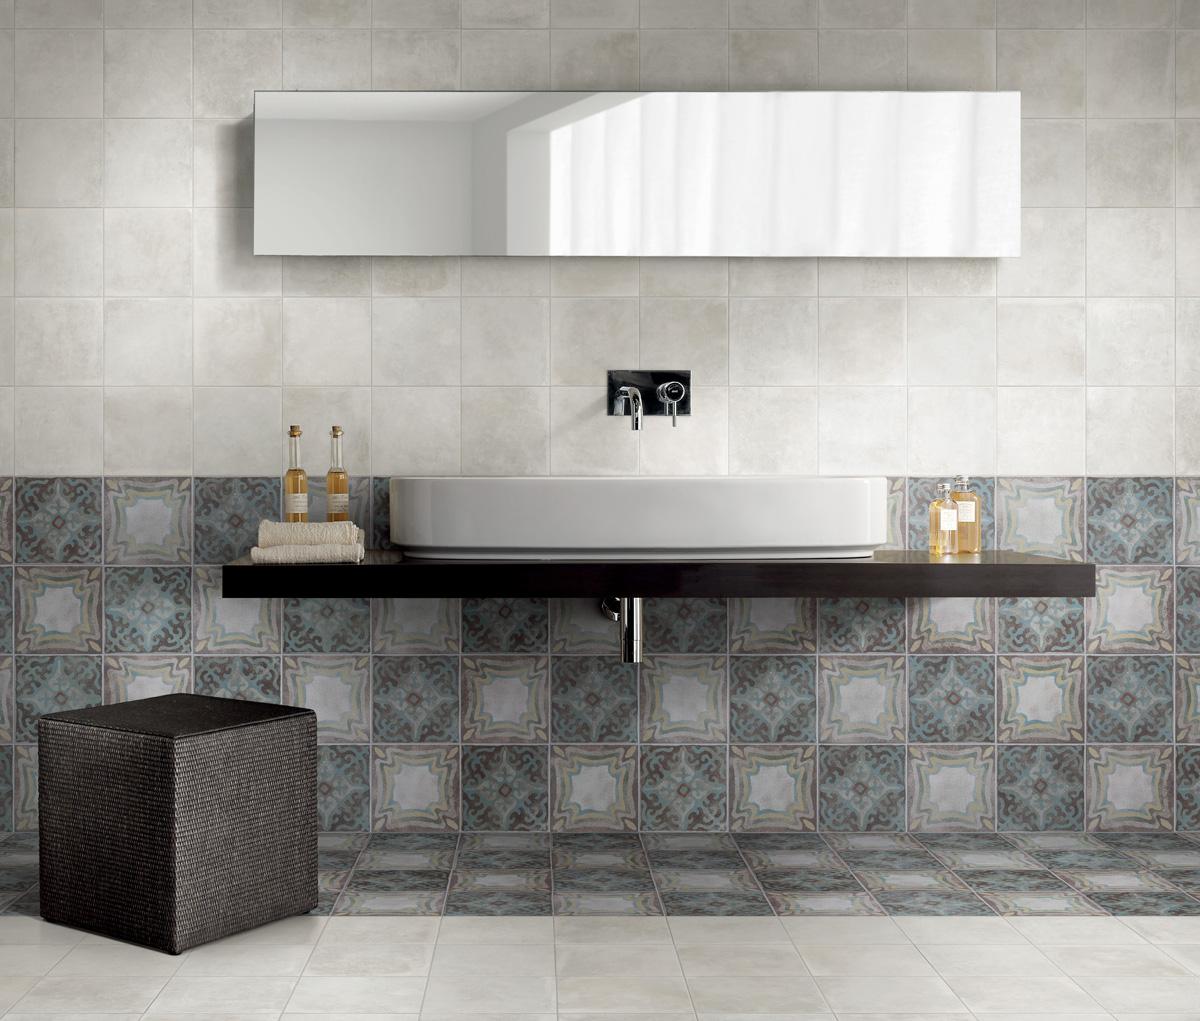 Panaria memory mood copper tegels tg wonen woonmagazine - Tegel patroon badkamer ...